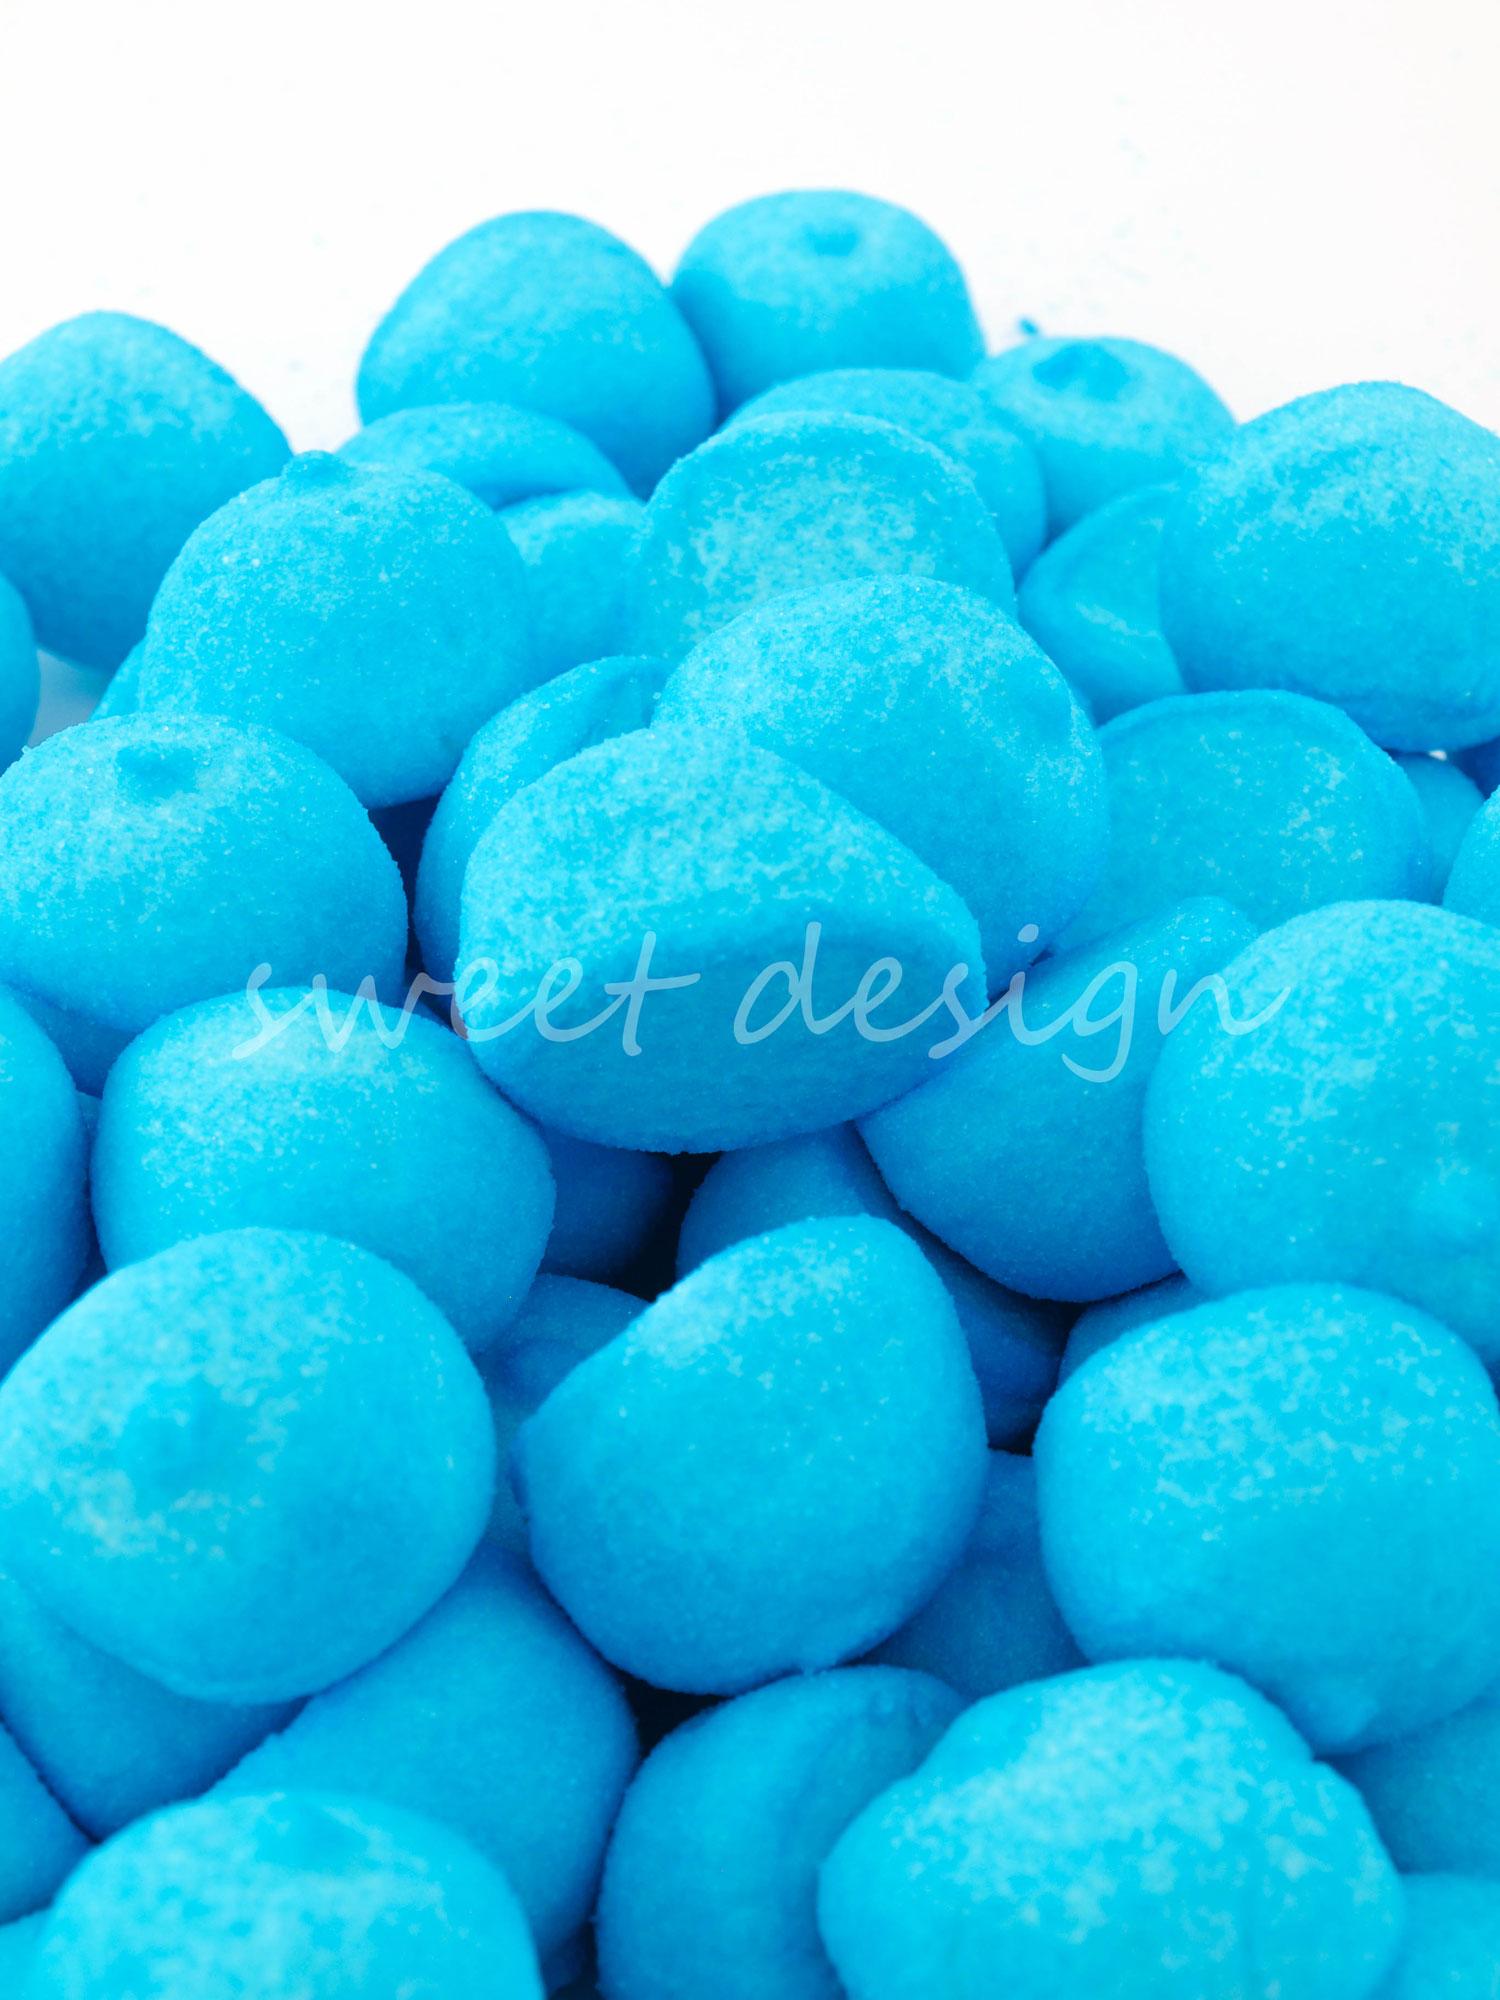 Bolas azules - Wikipedia, la enciclopedia libre